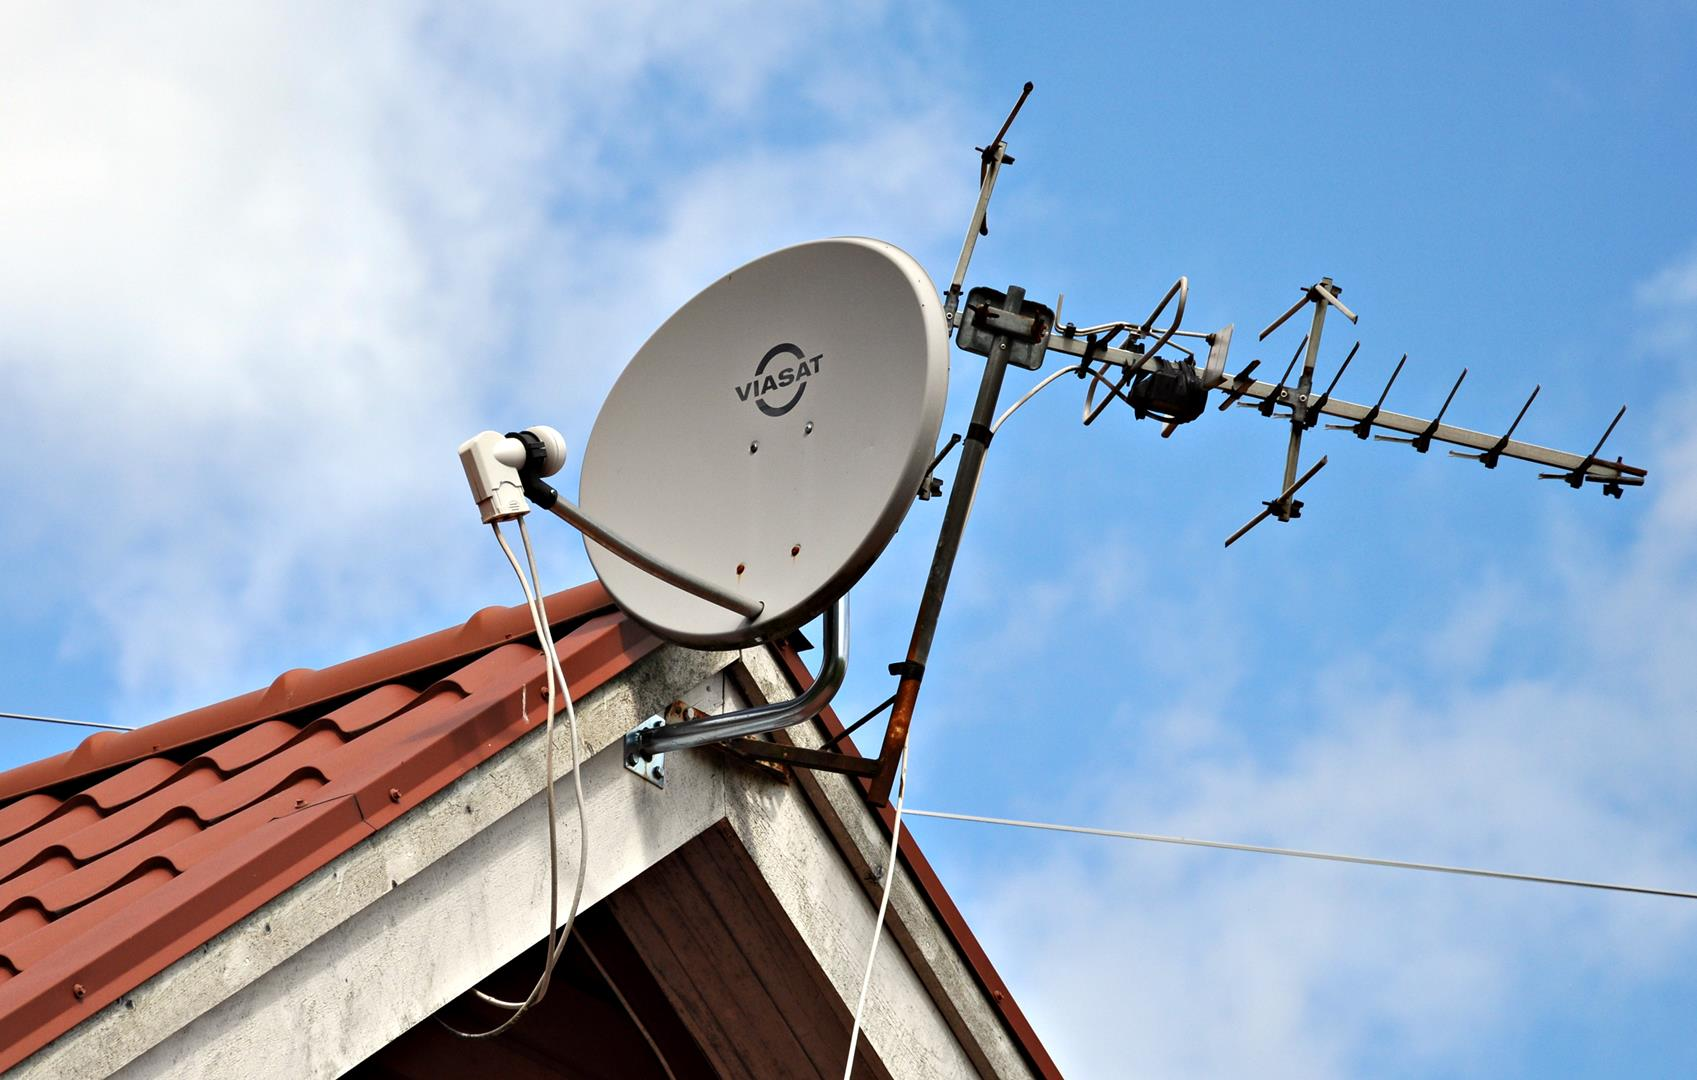 Viasat - service. - Gestrike antennservice